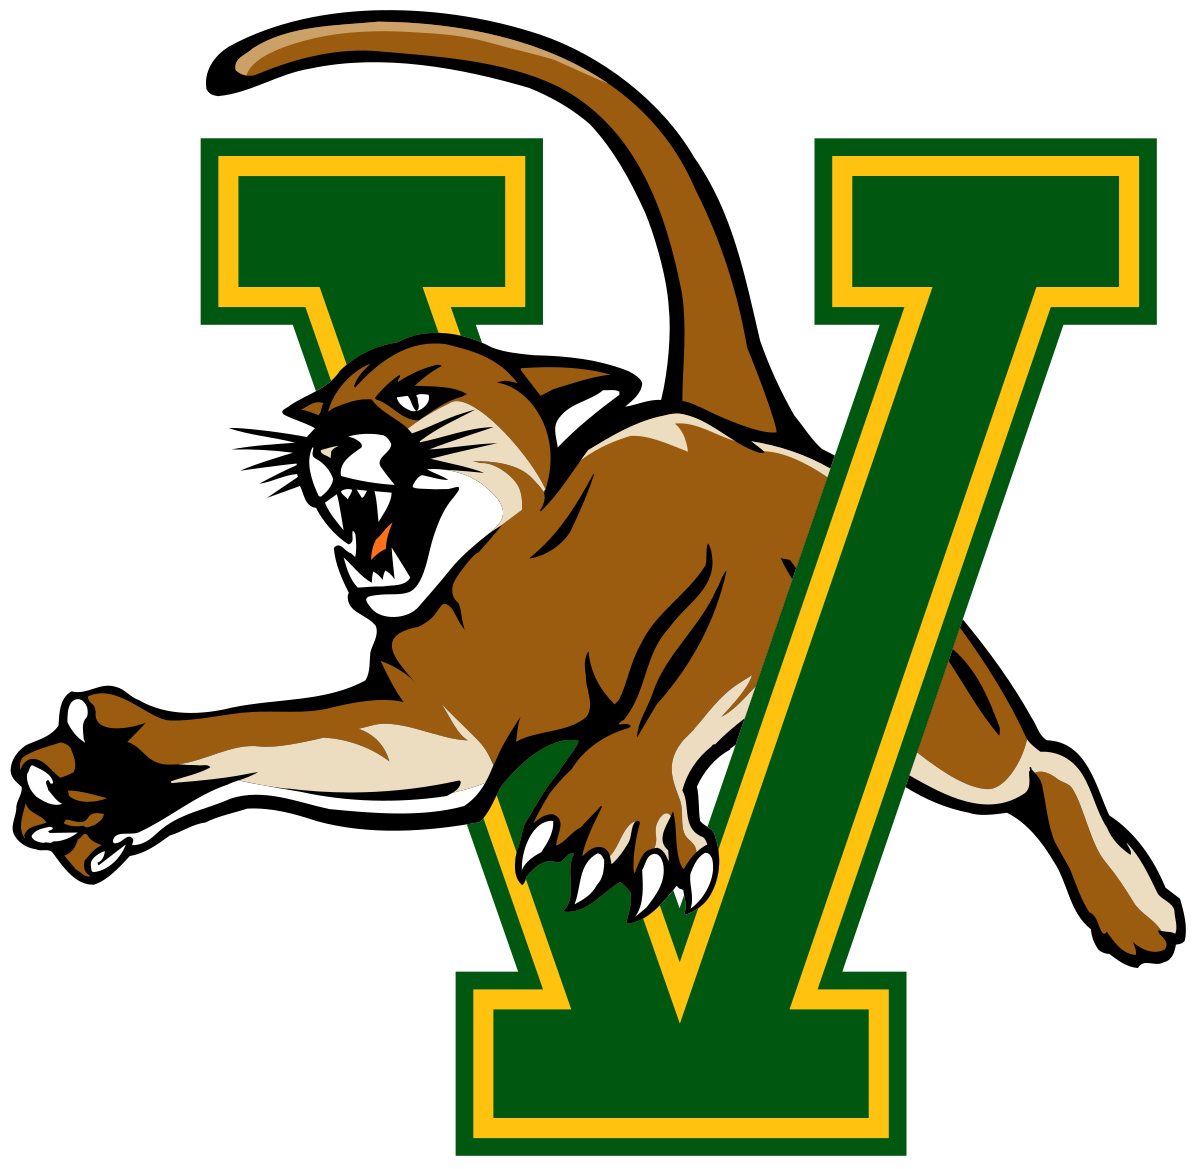 University of Vermont - Ava Vasile '23